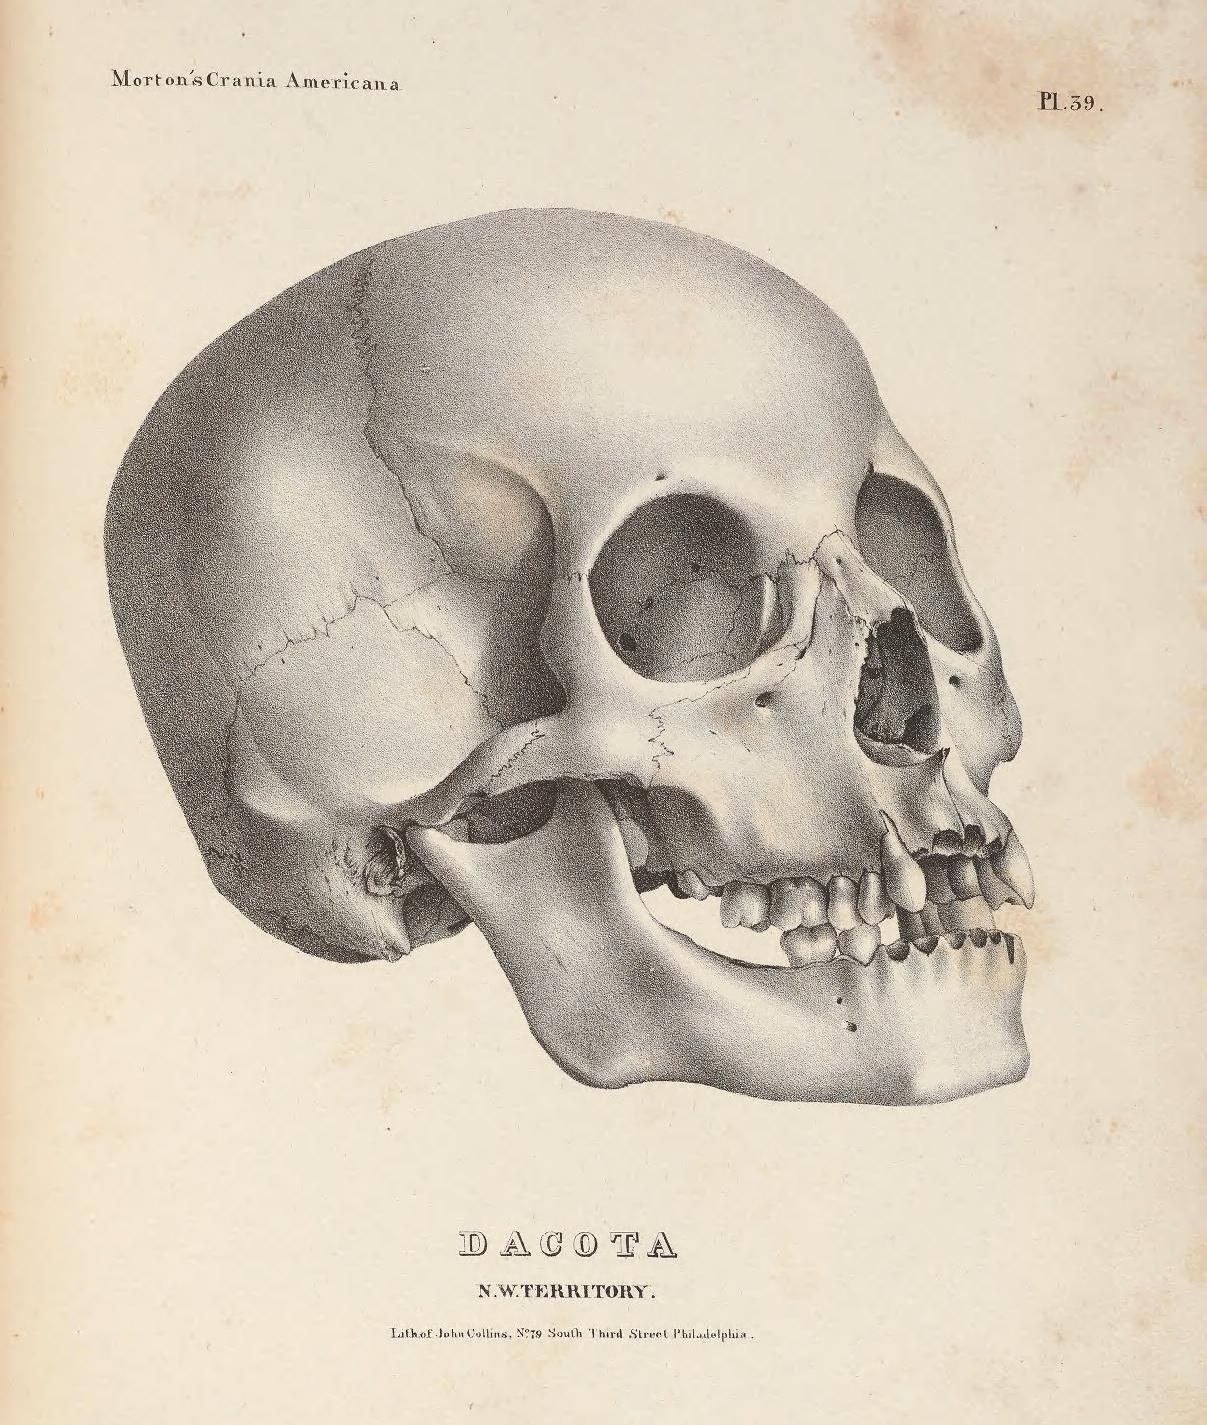 UPenn Morton Collection skull collection